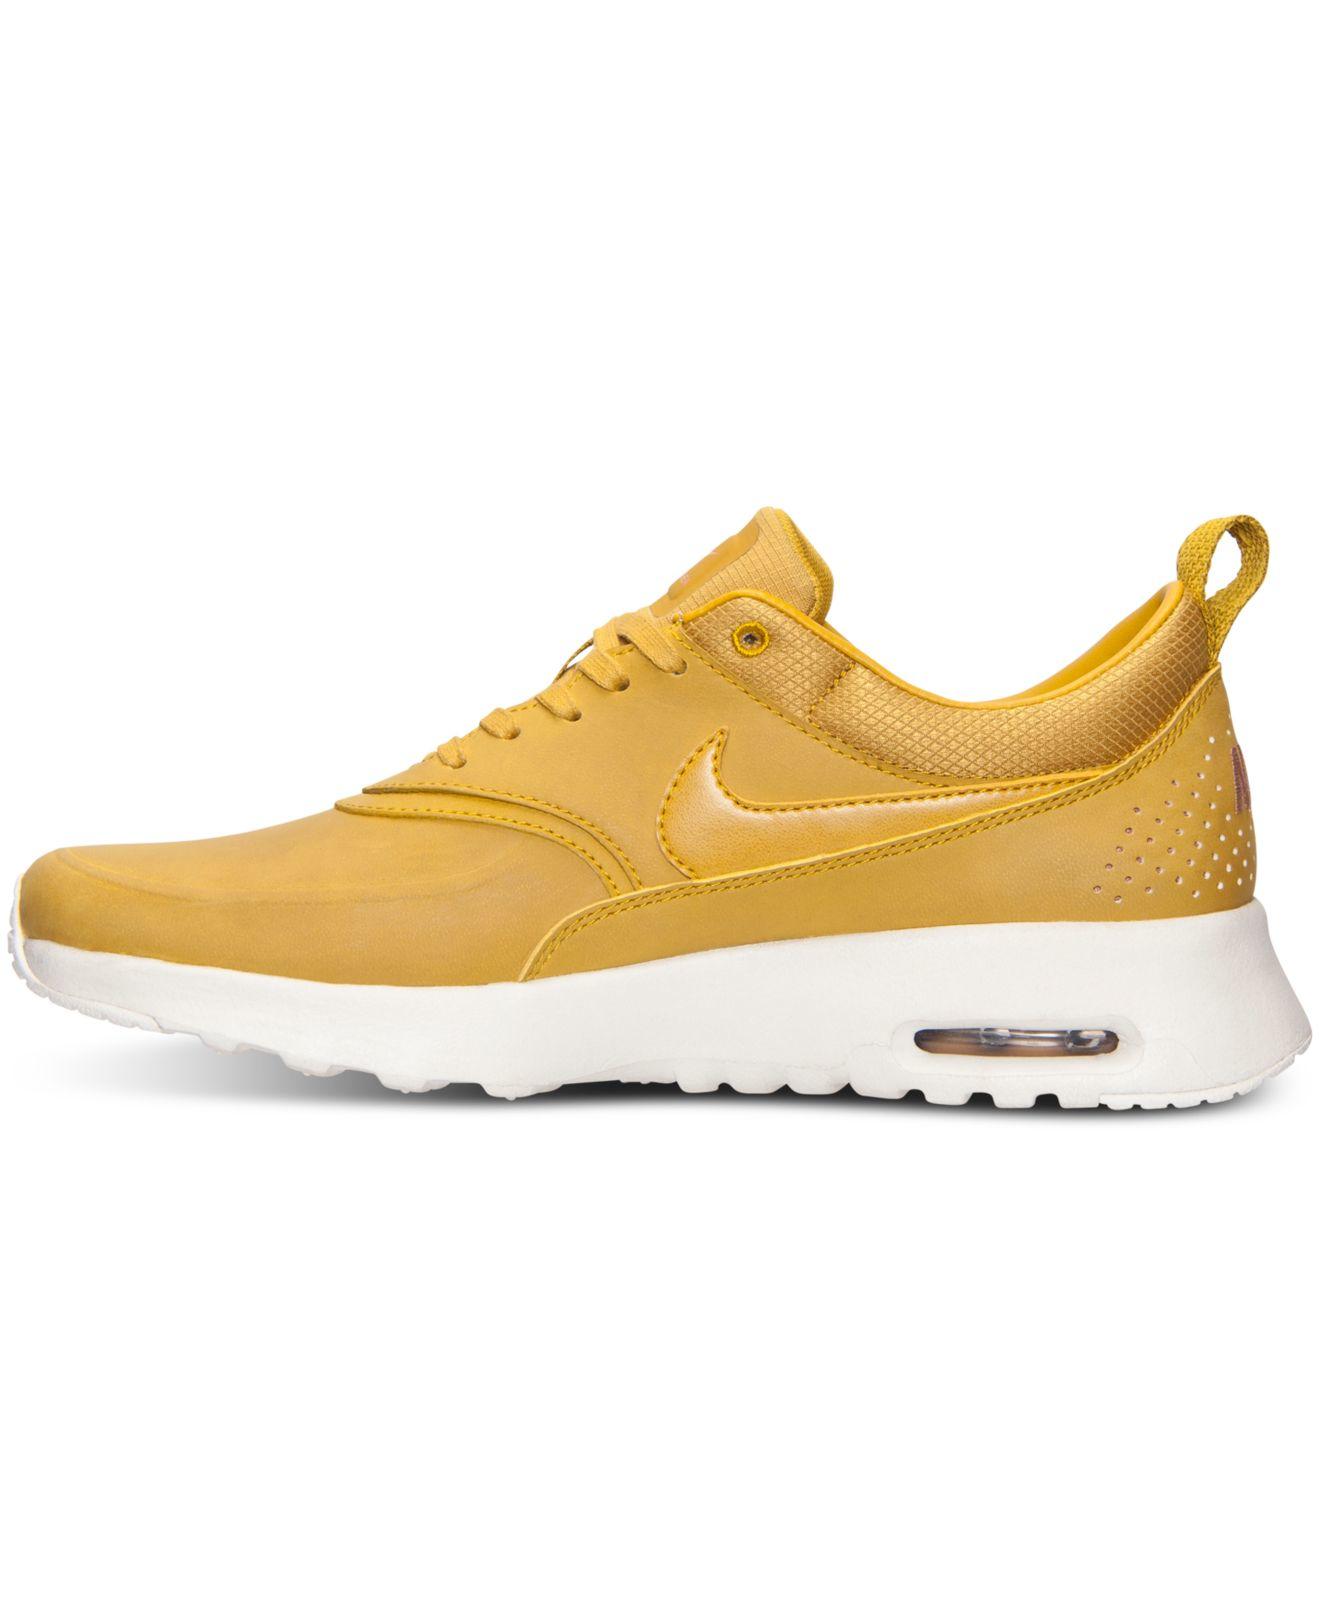 Nike Women's Air Max Thea Premium Running Sneakers from